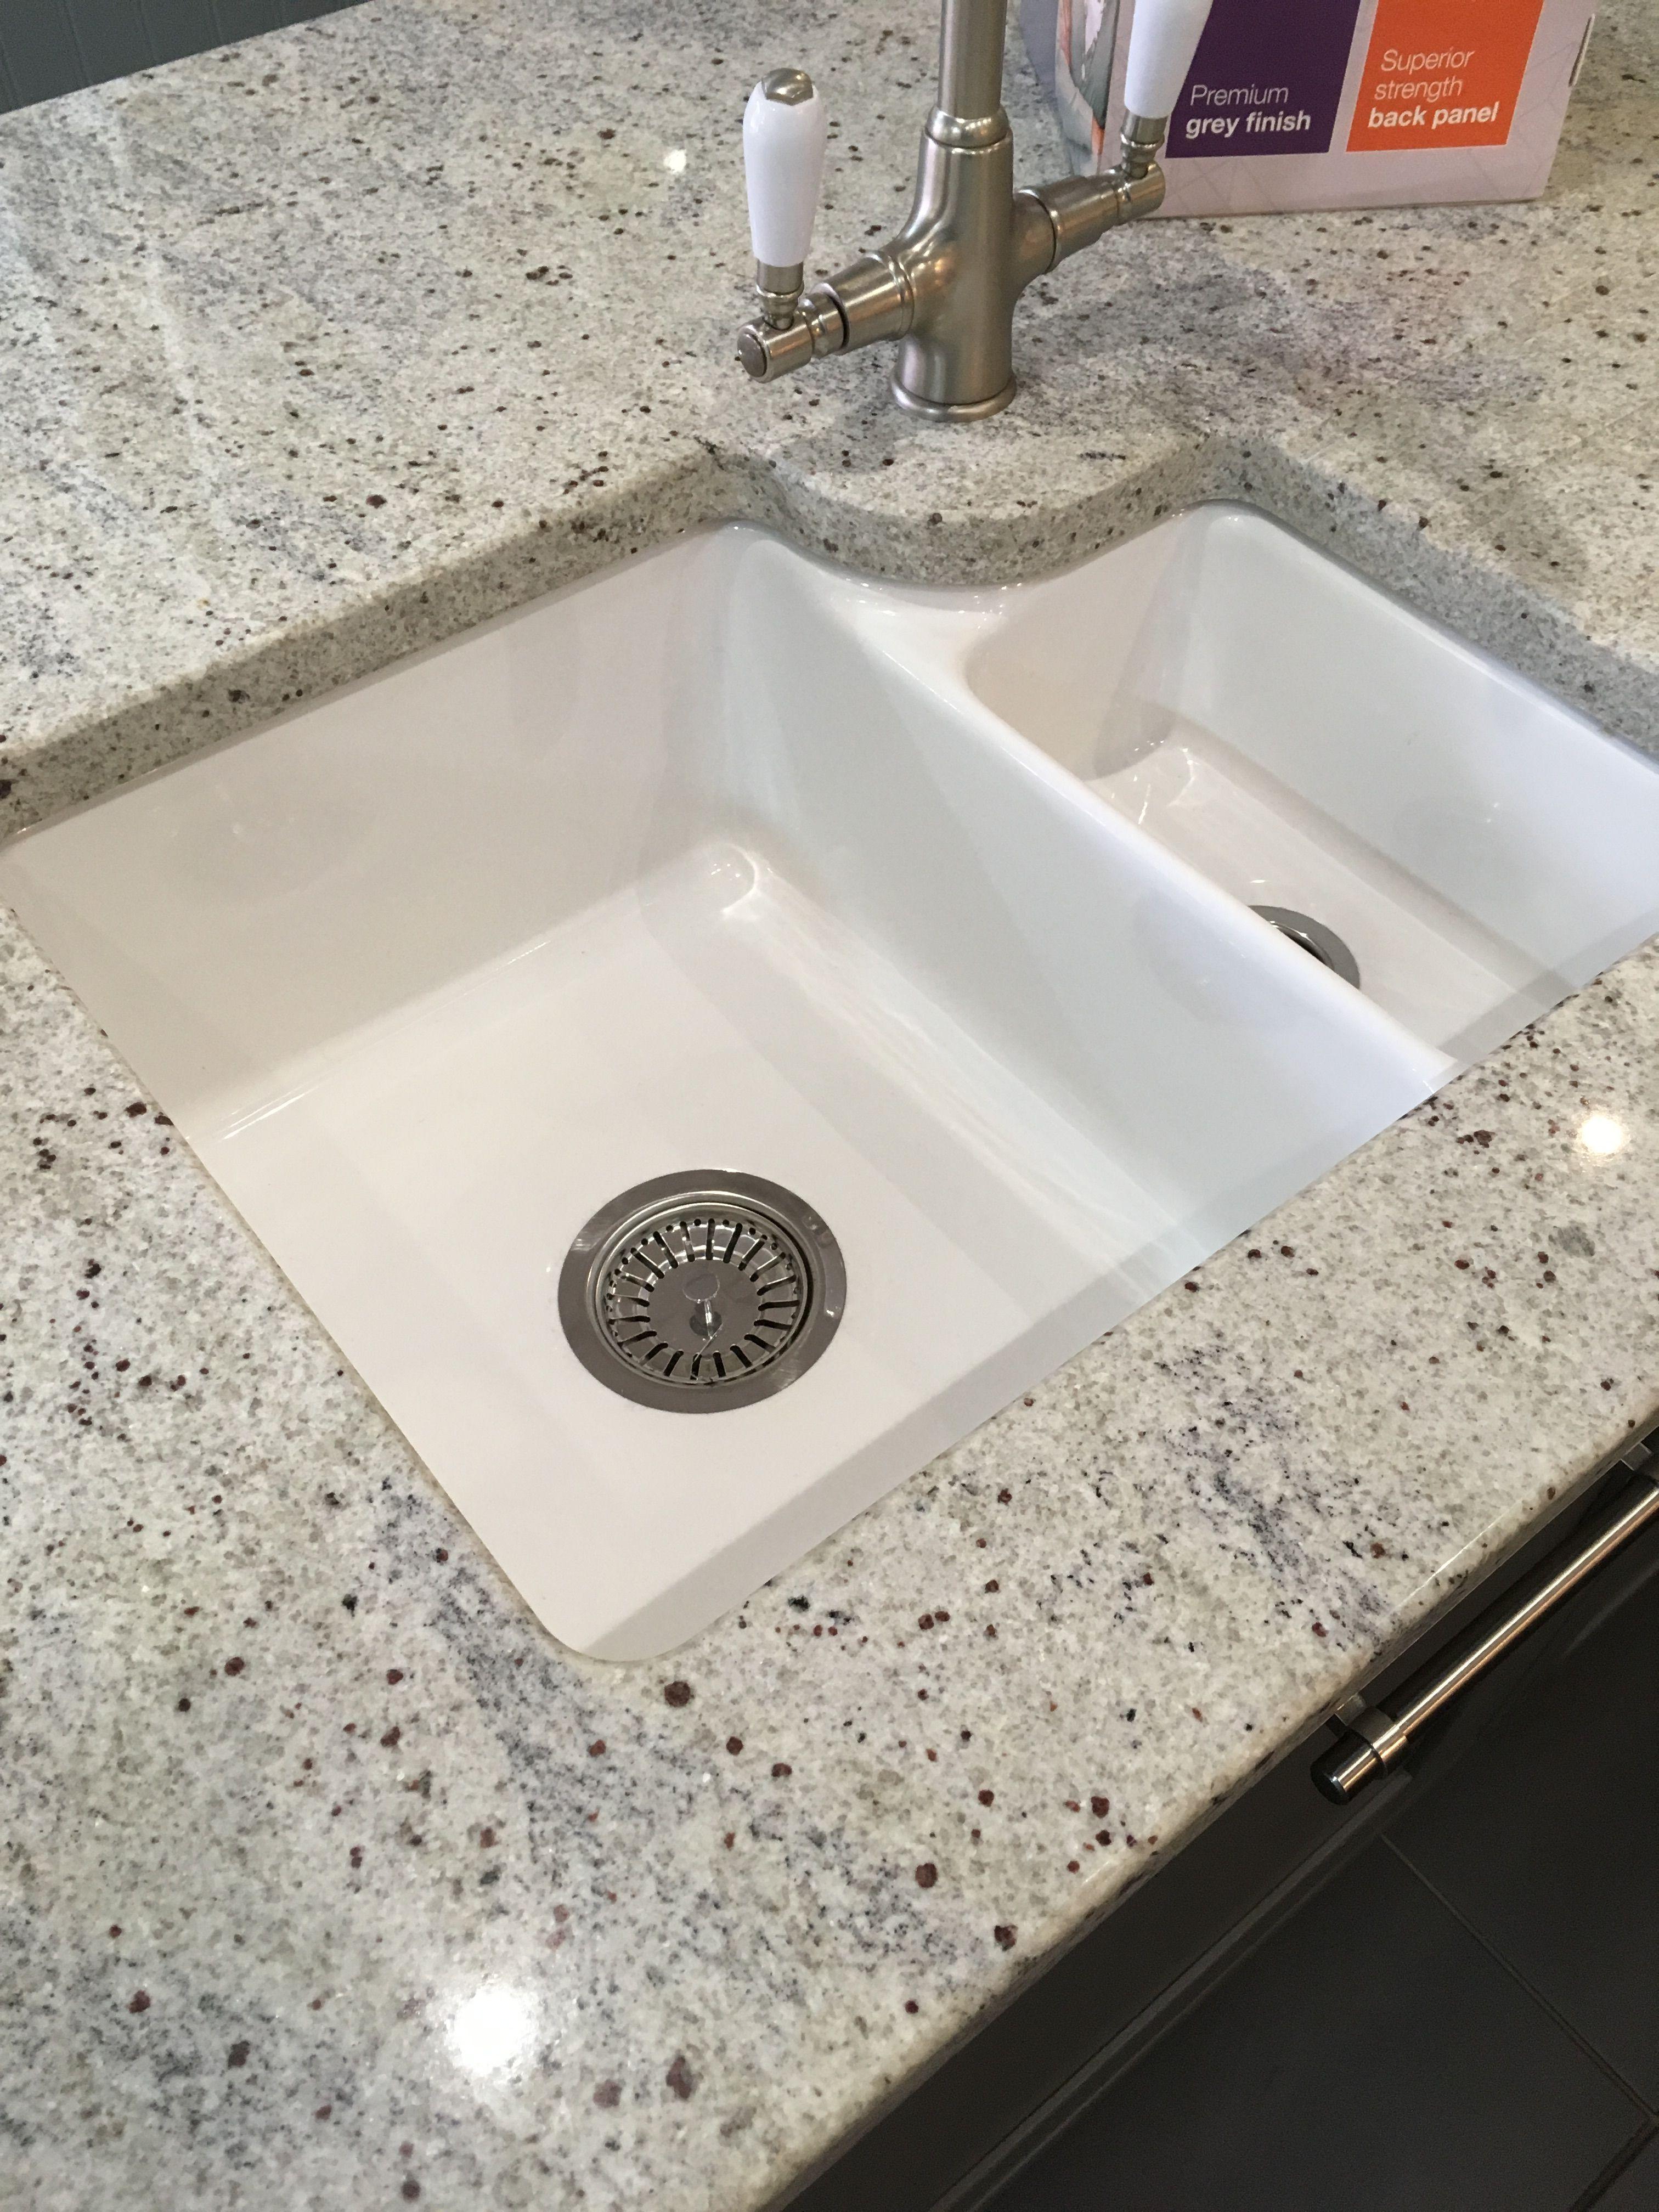 Magnet Kitchen Sinks Undermount porcelain sink 15 magnet kitchen pinterest undermount porcelain sink 15 magnet workwithnaturefo